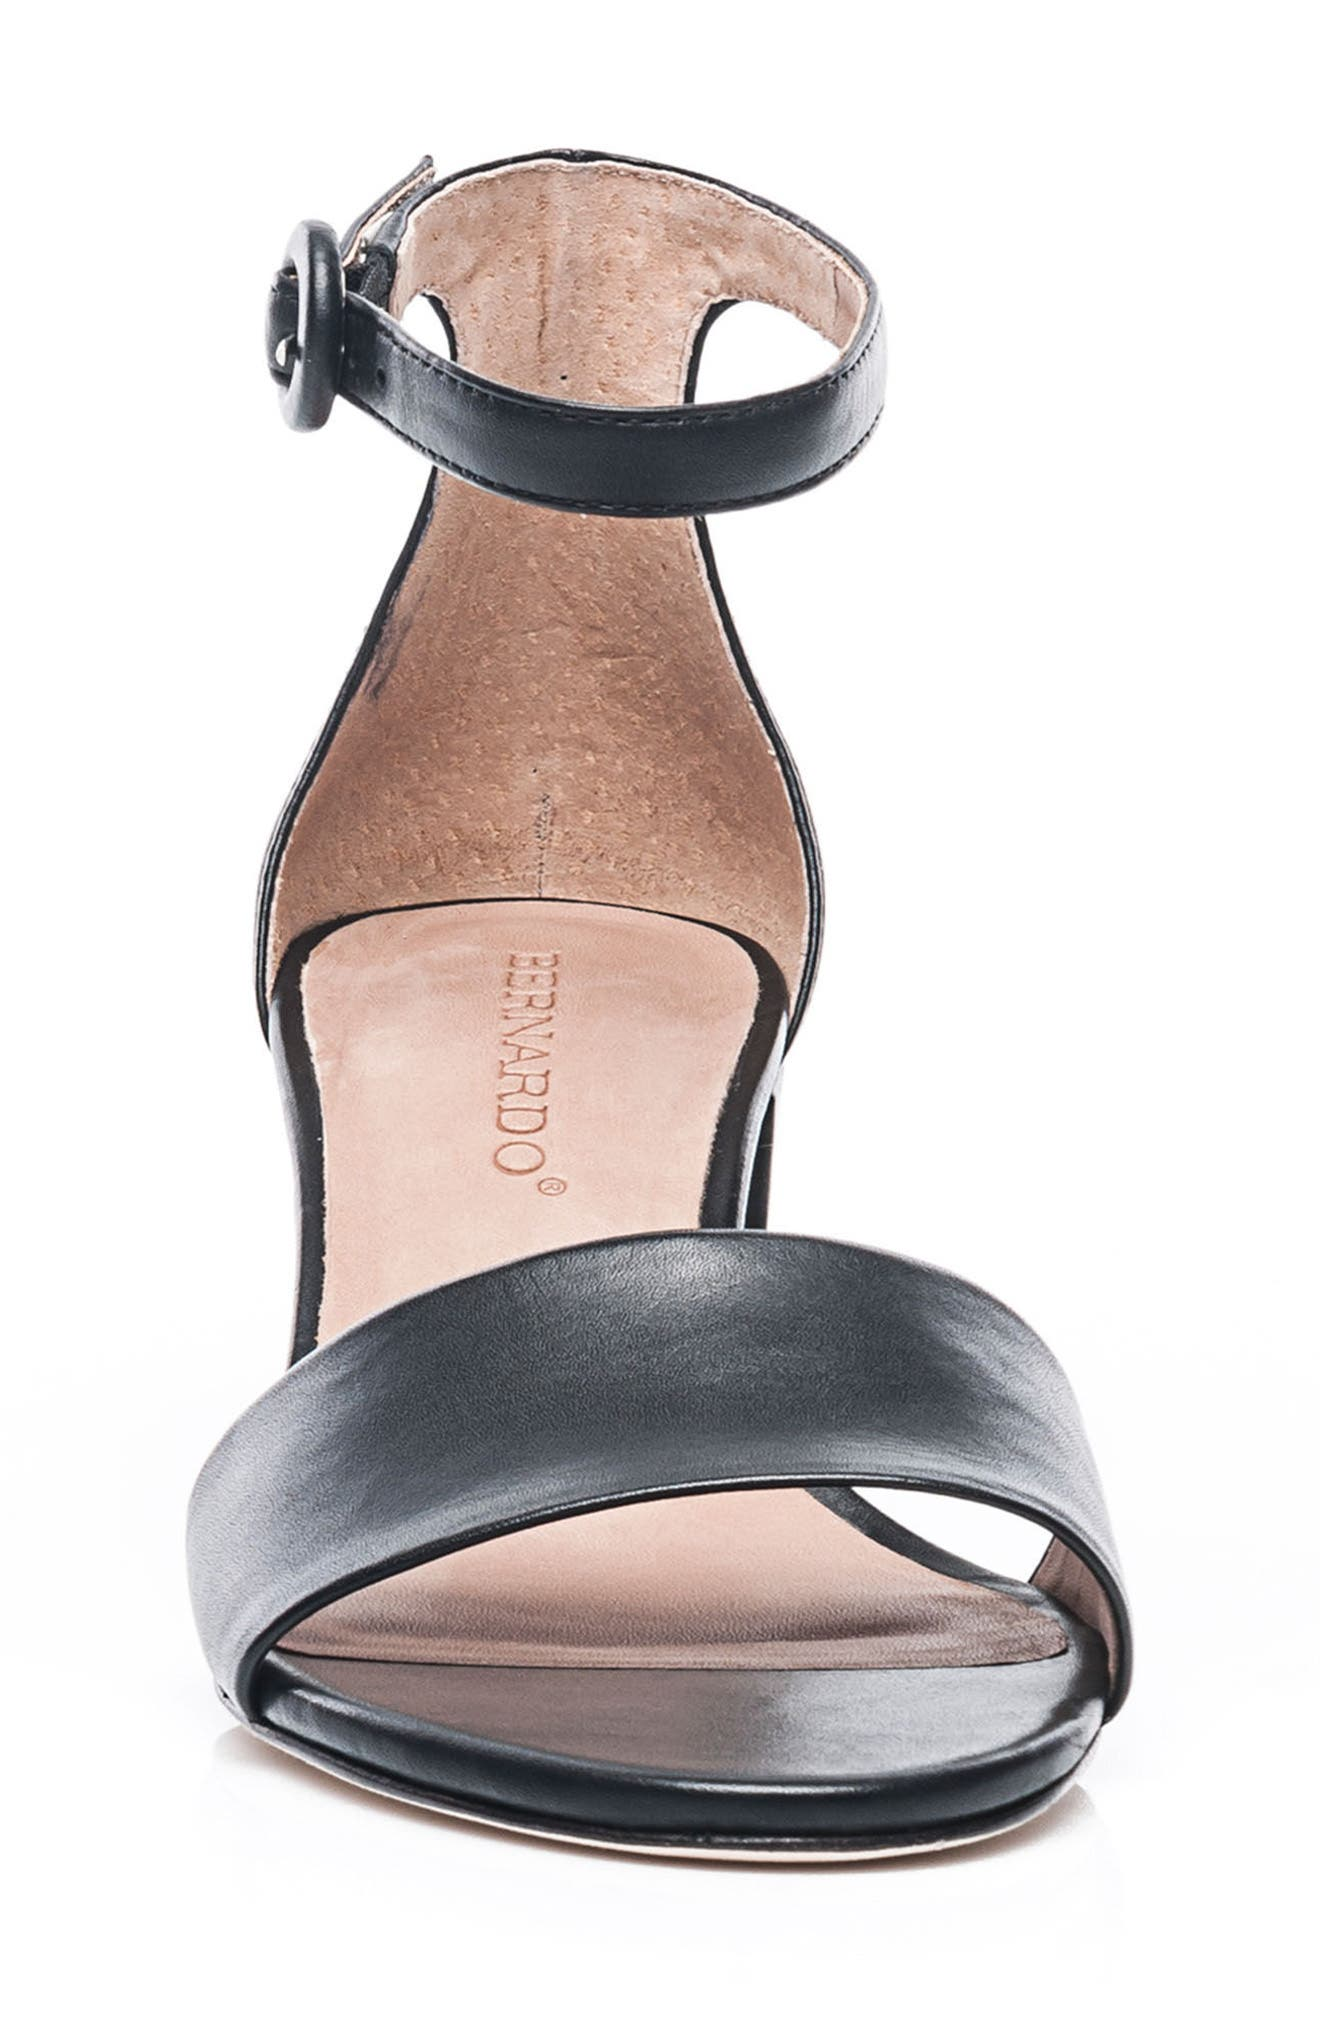 Bernardo Belinda Ankle Strap Sandal,                             Alternate thumbnail 4, color,                             BLACK LEATHER